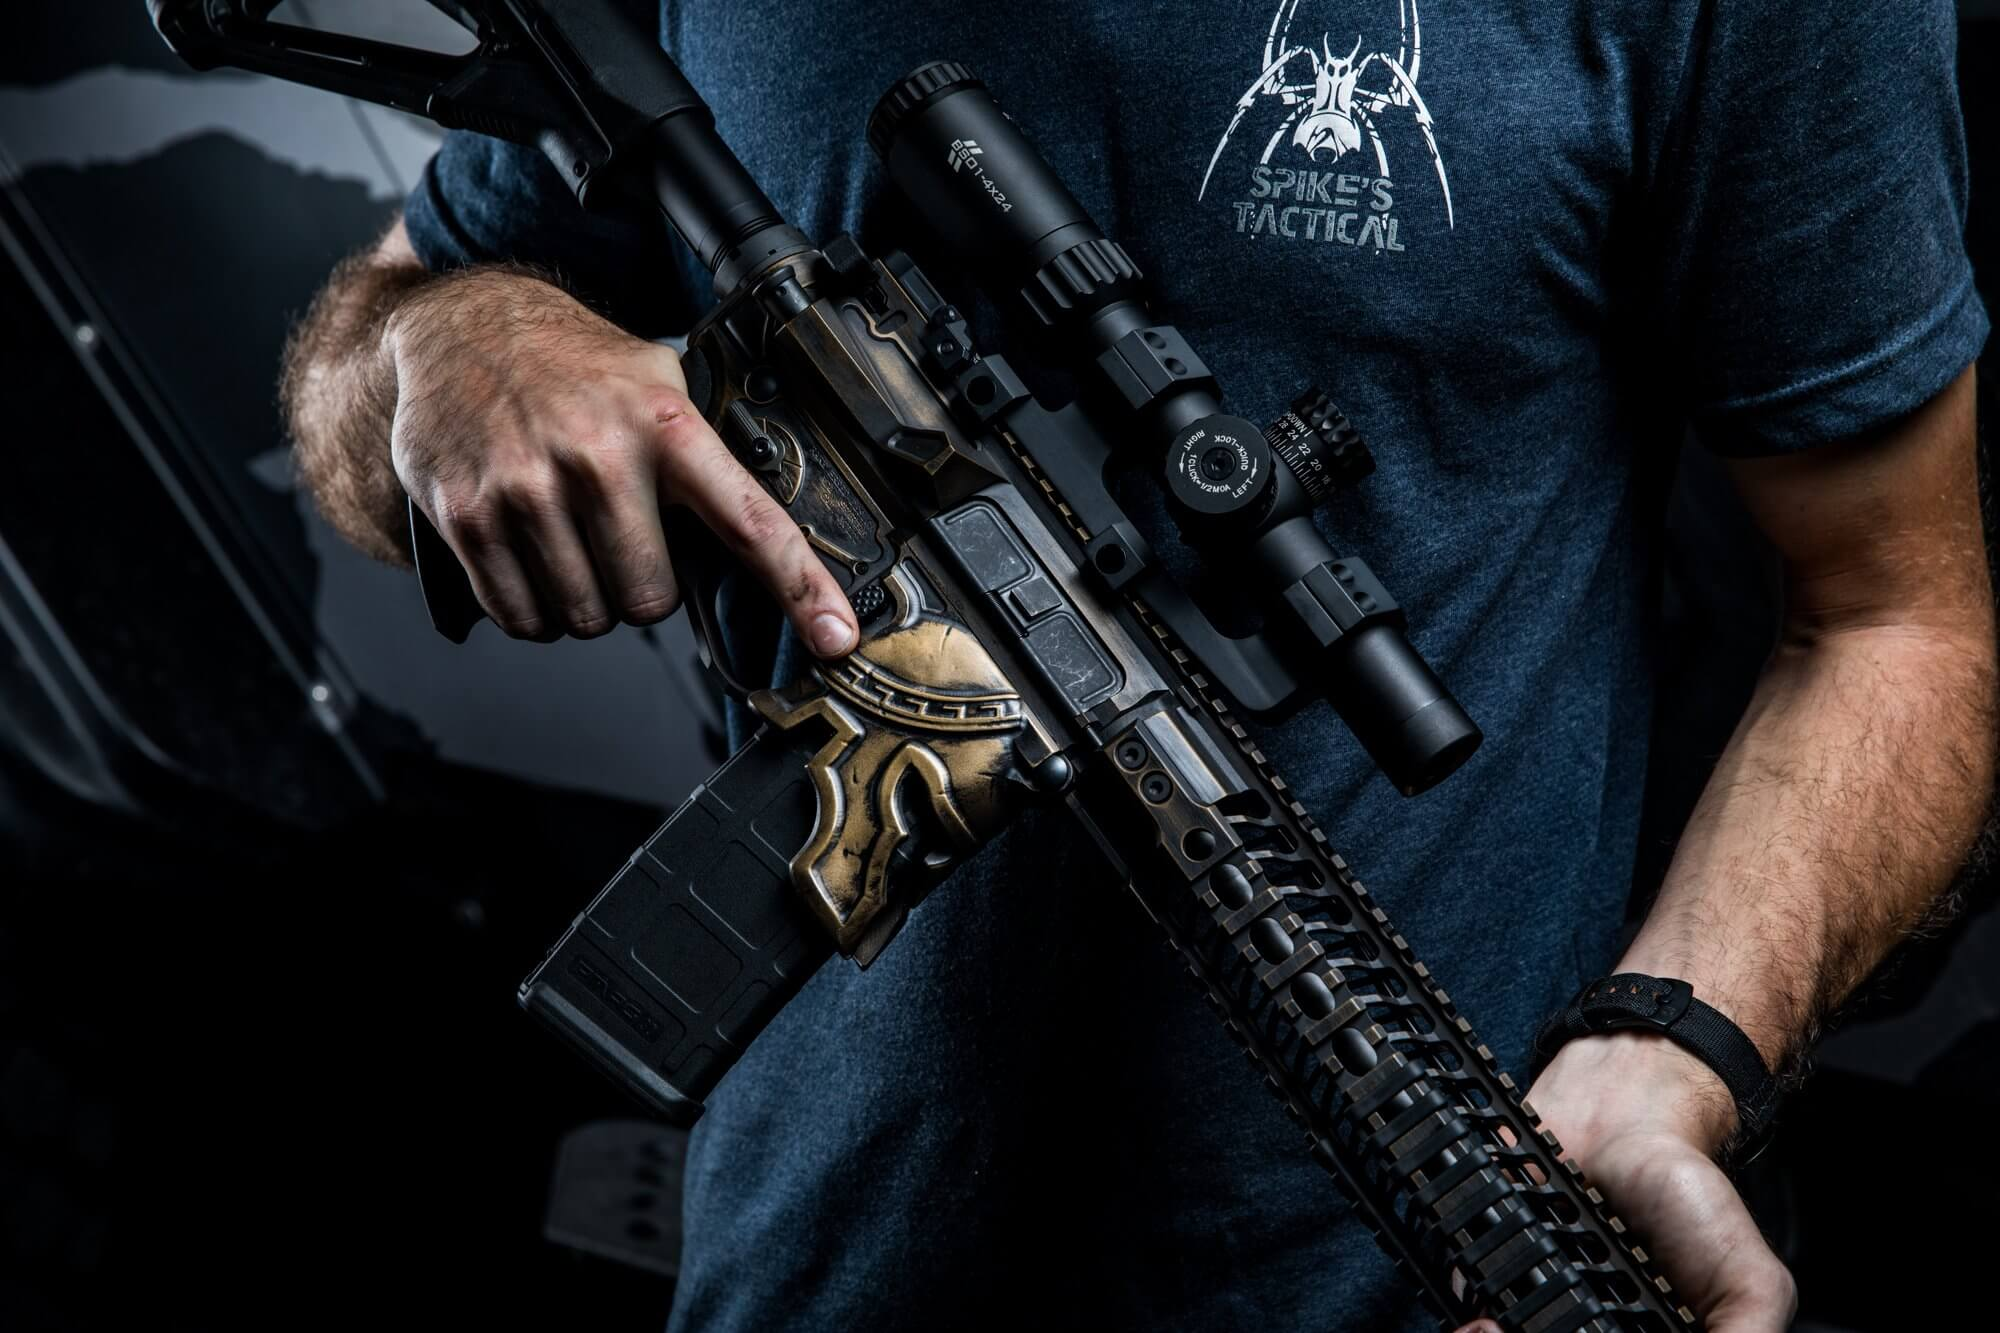 Long-awaited Spike's Tactical 3D AR-15 Spartan helmet lower receiver to go on sale Friday